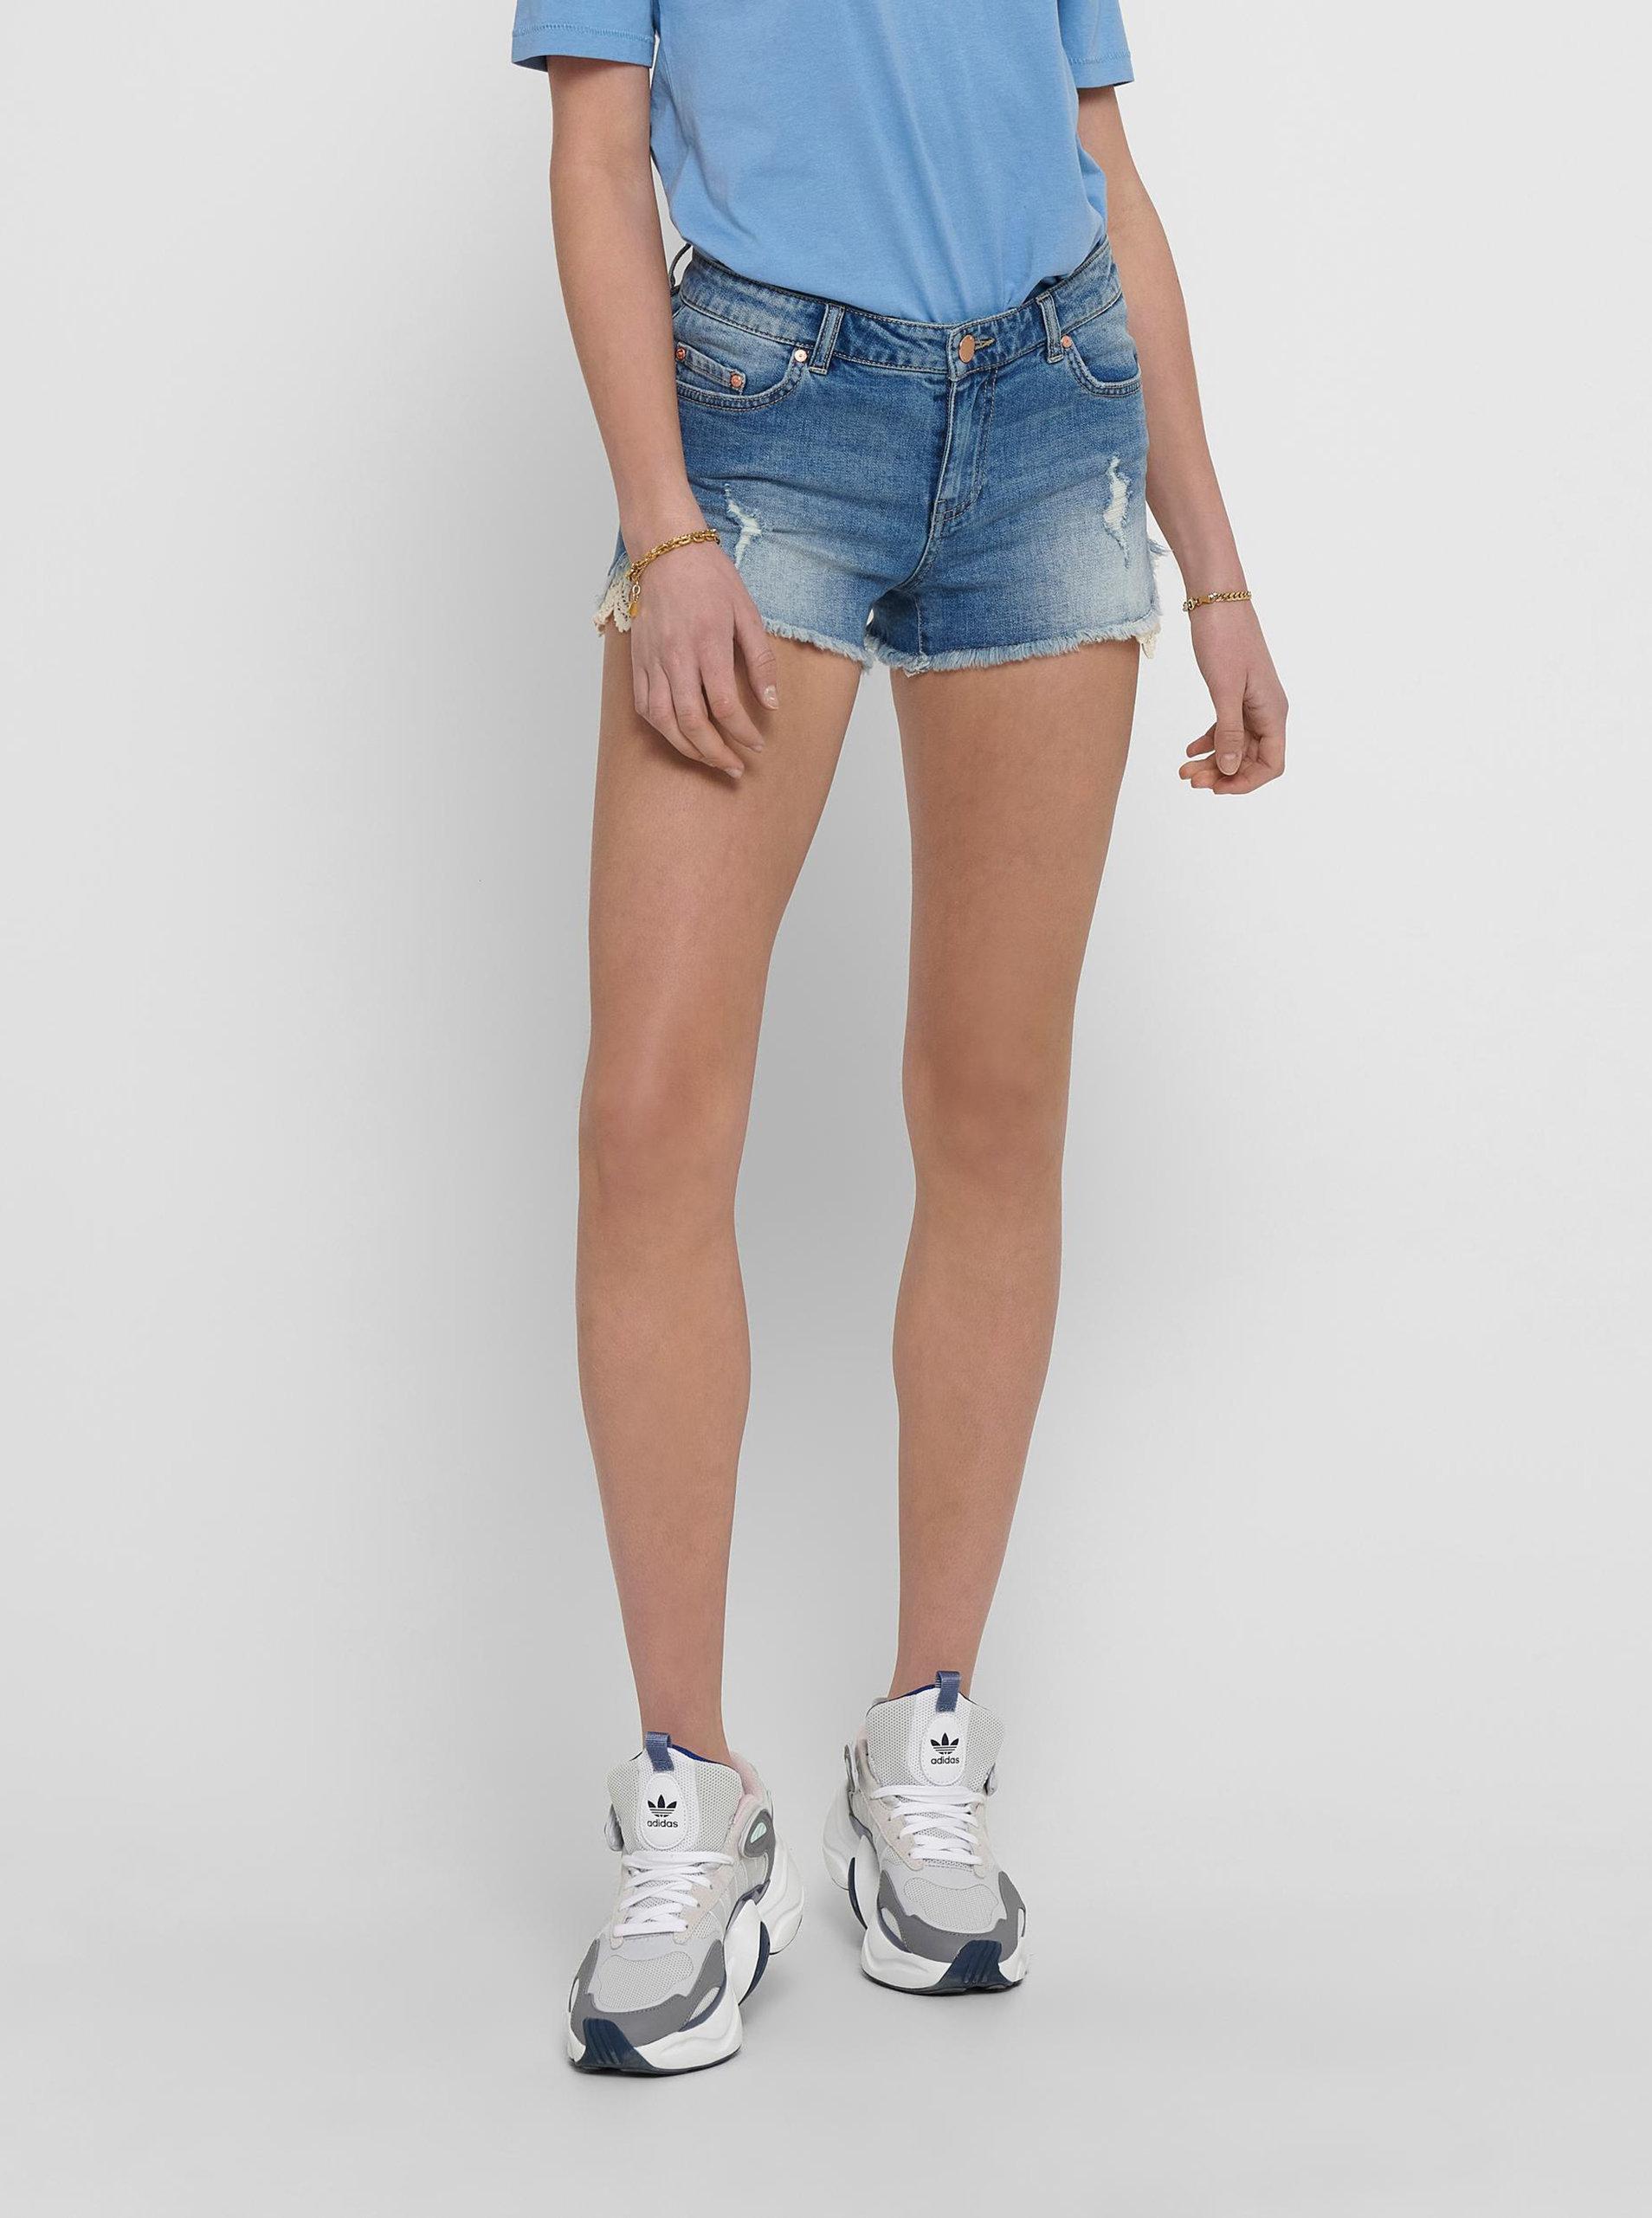 Modré džínové kraťasy s krajkovými detaily ONLY Carmen